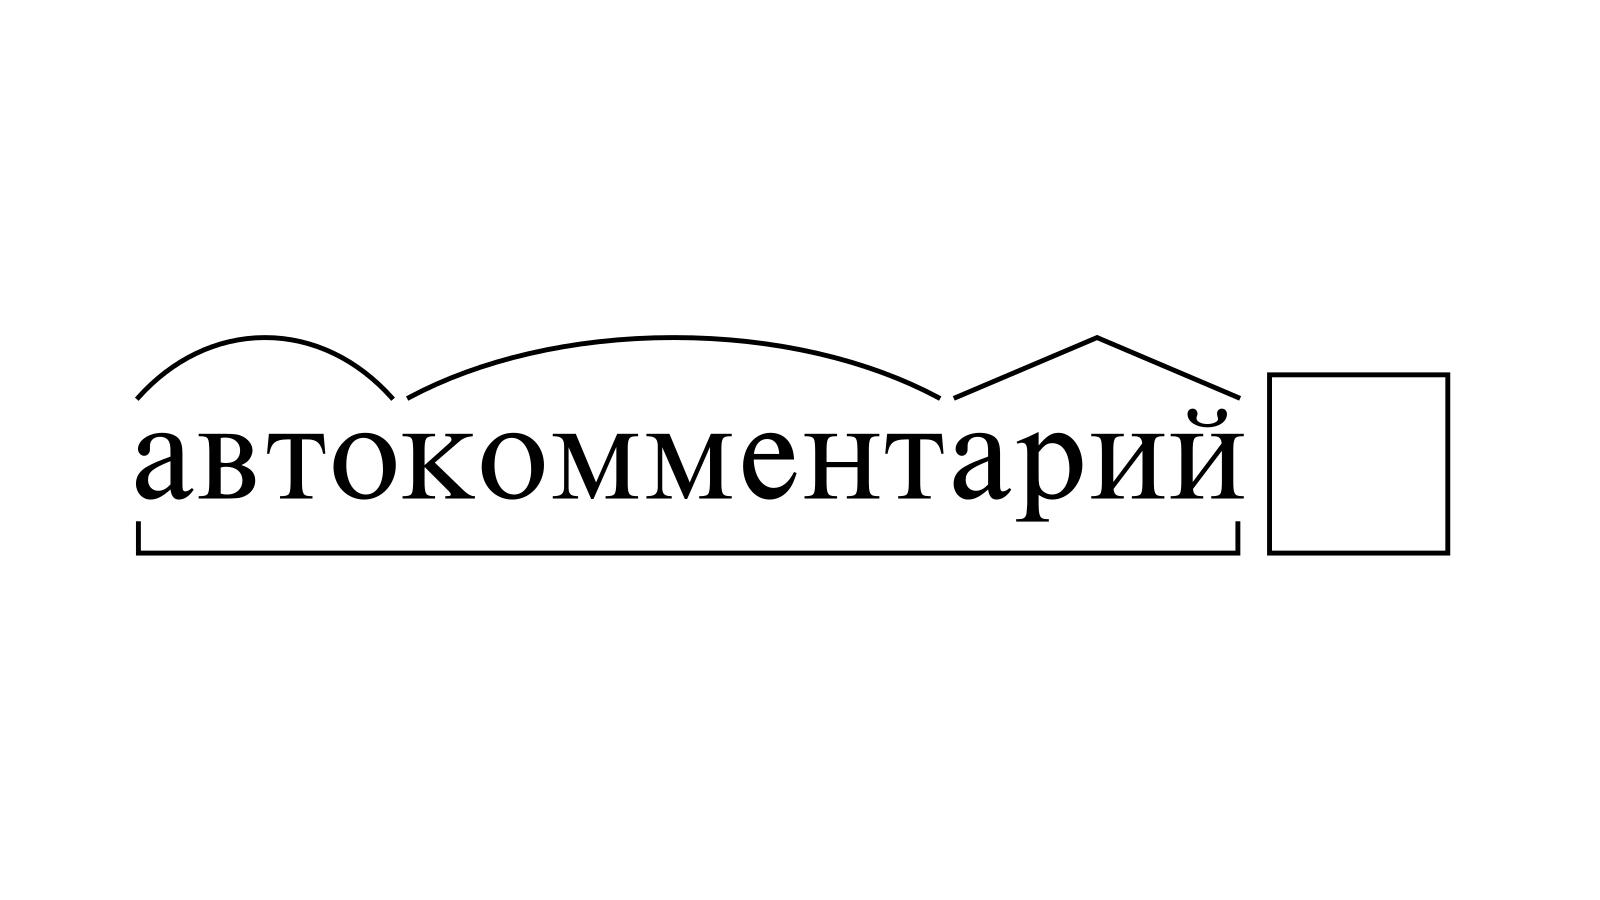 Разбор слова «автокомментарий» по составу